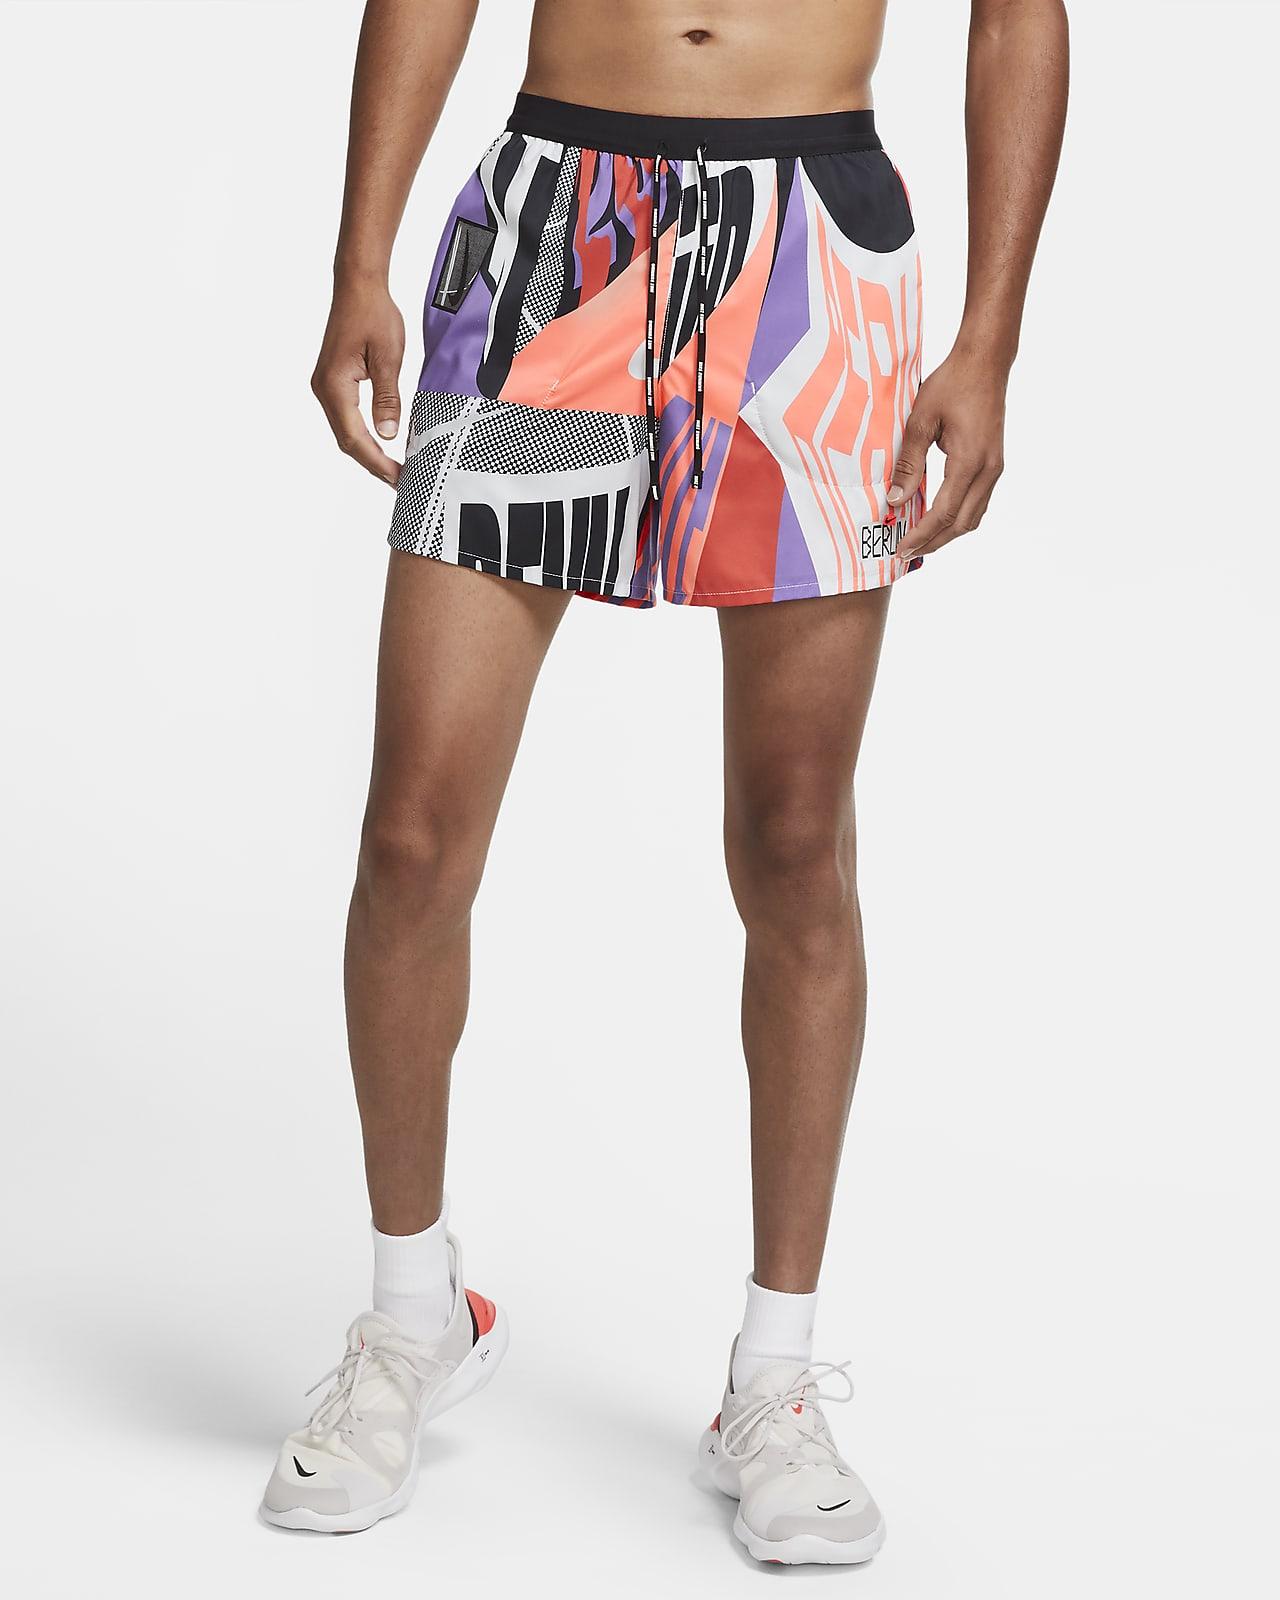 Nike Flex Stride Berlin Hardloopshorts met binnenbroek voor heren (13 cm)